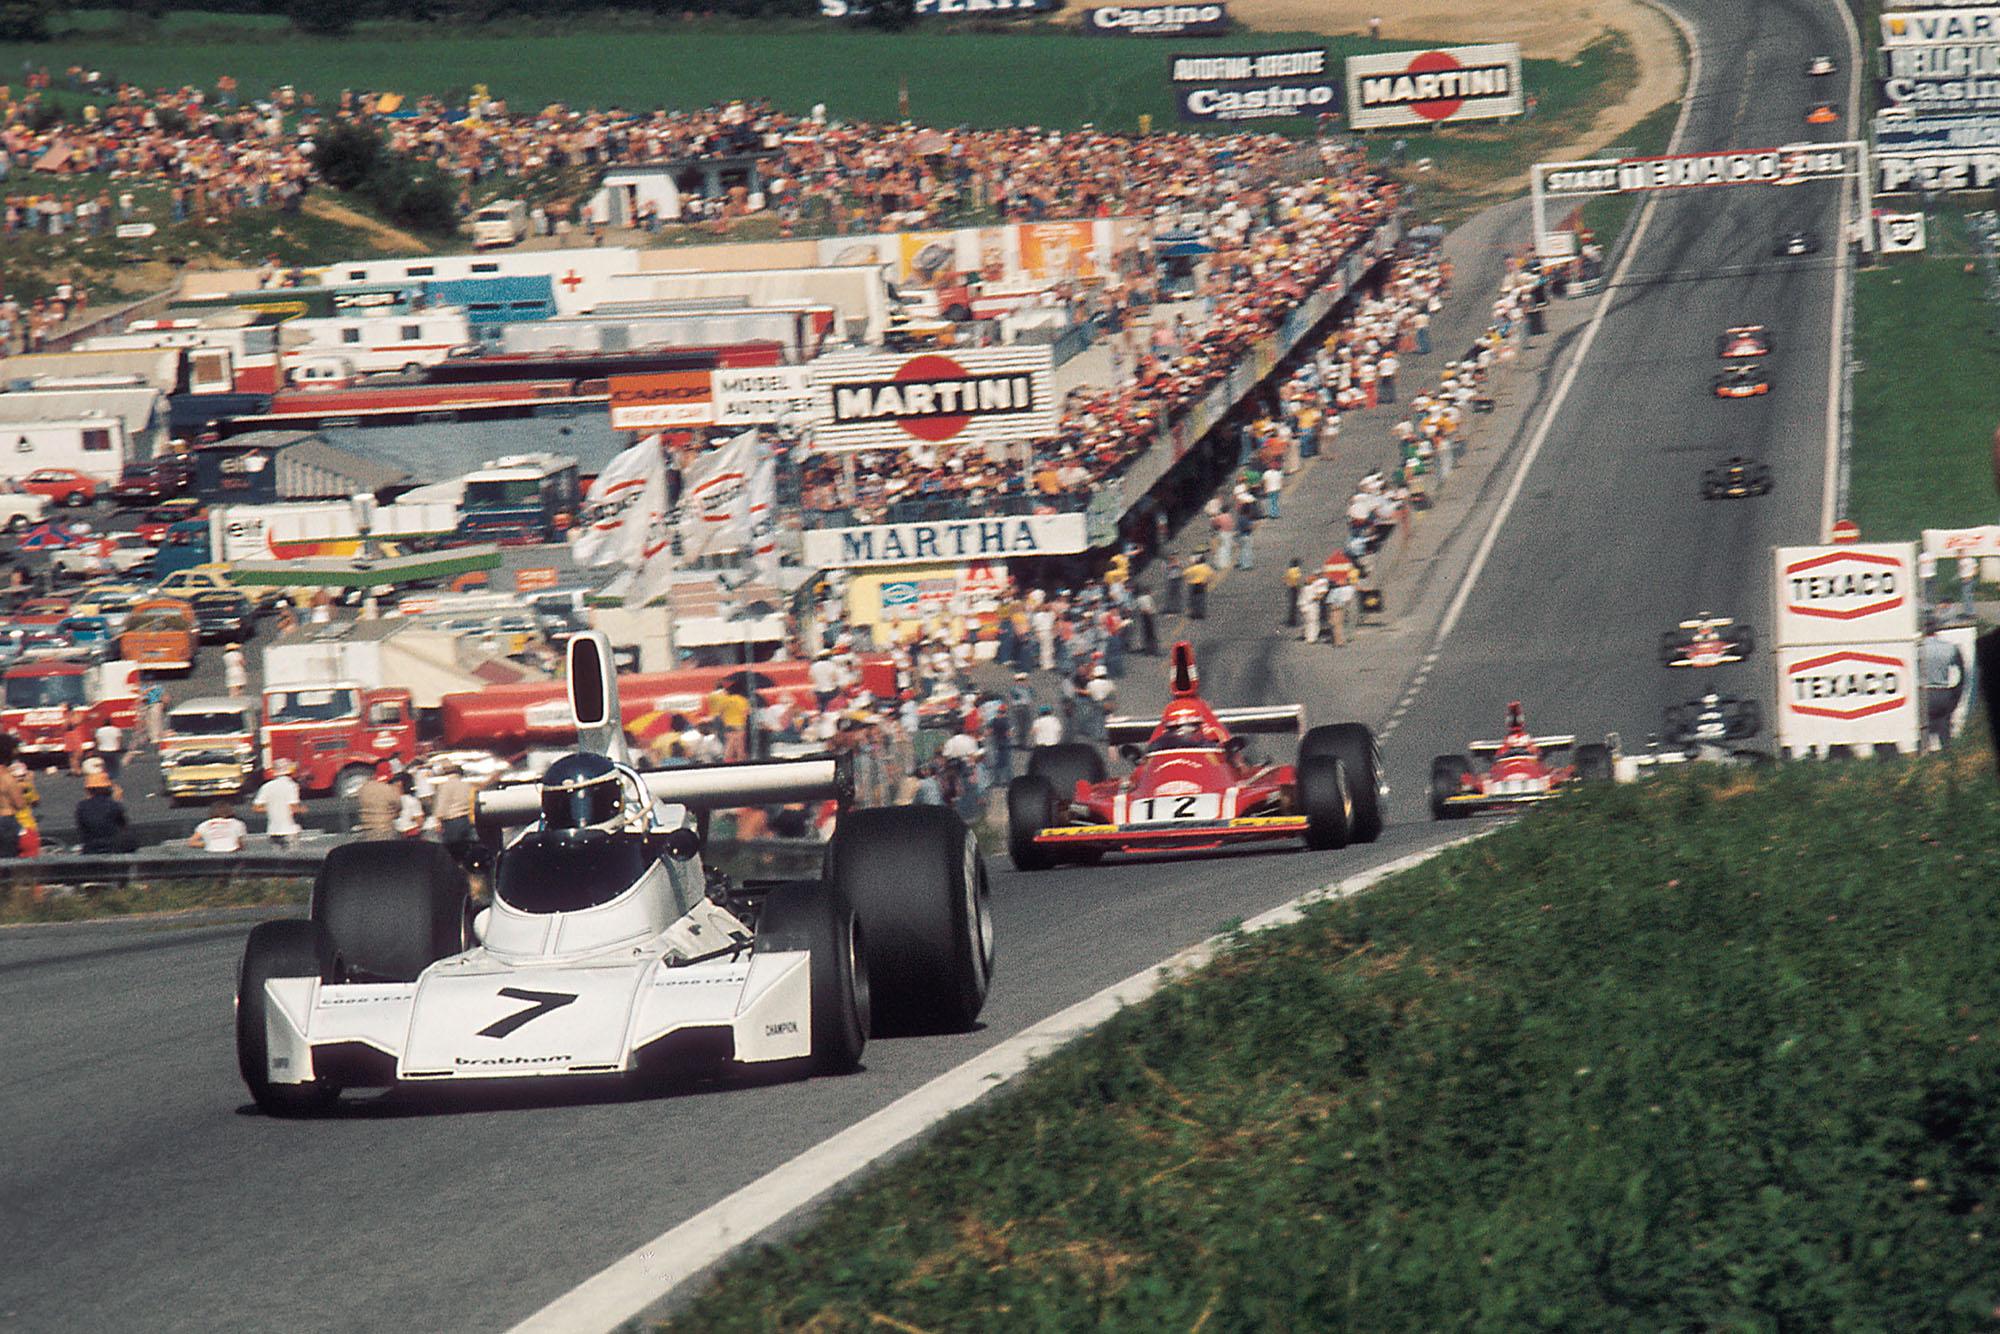 Carlos Reutemann (Brabham) leads Niki Lauda (Ferrari) up hill at the 1974 Austraian Grand Prix.